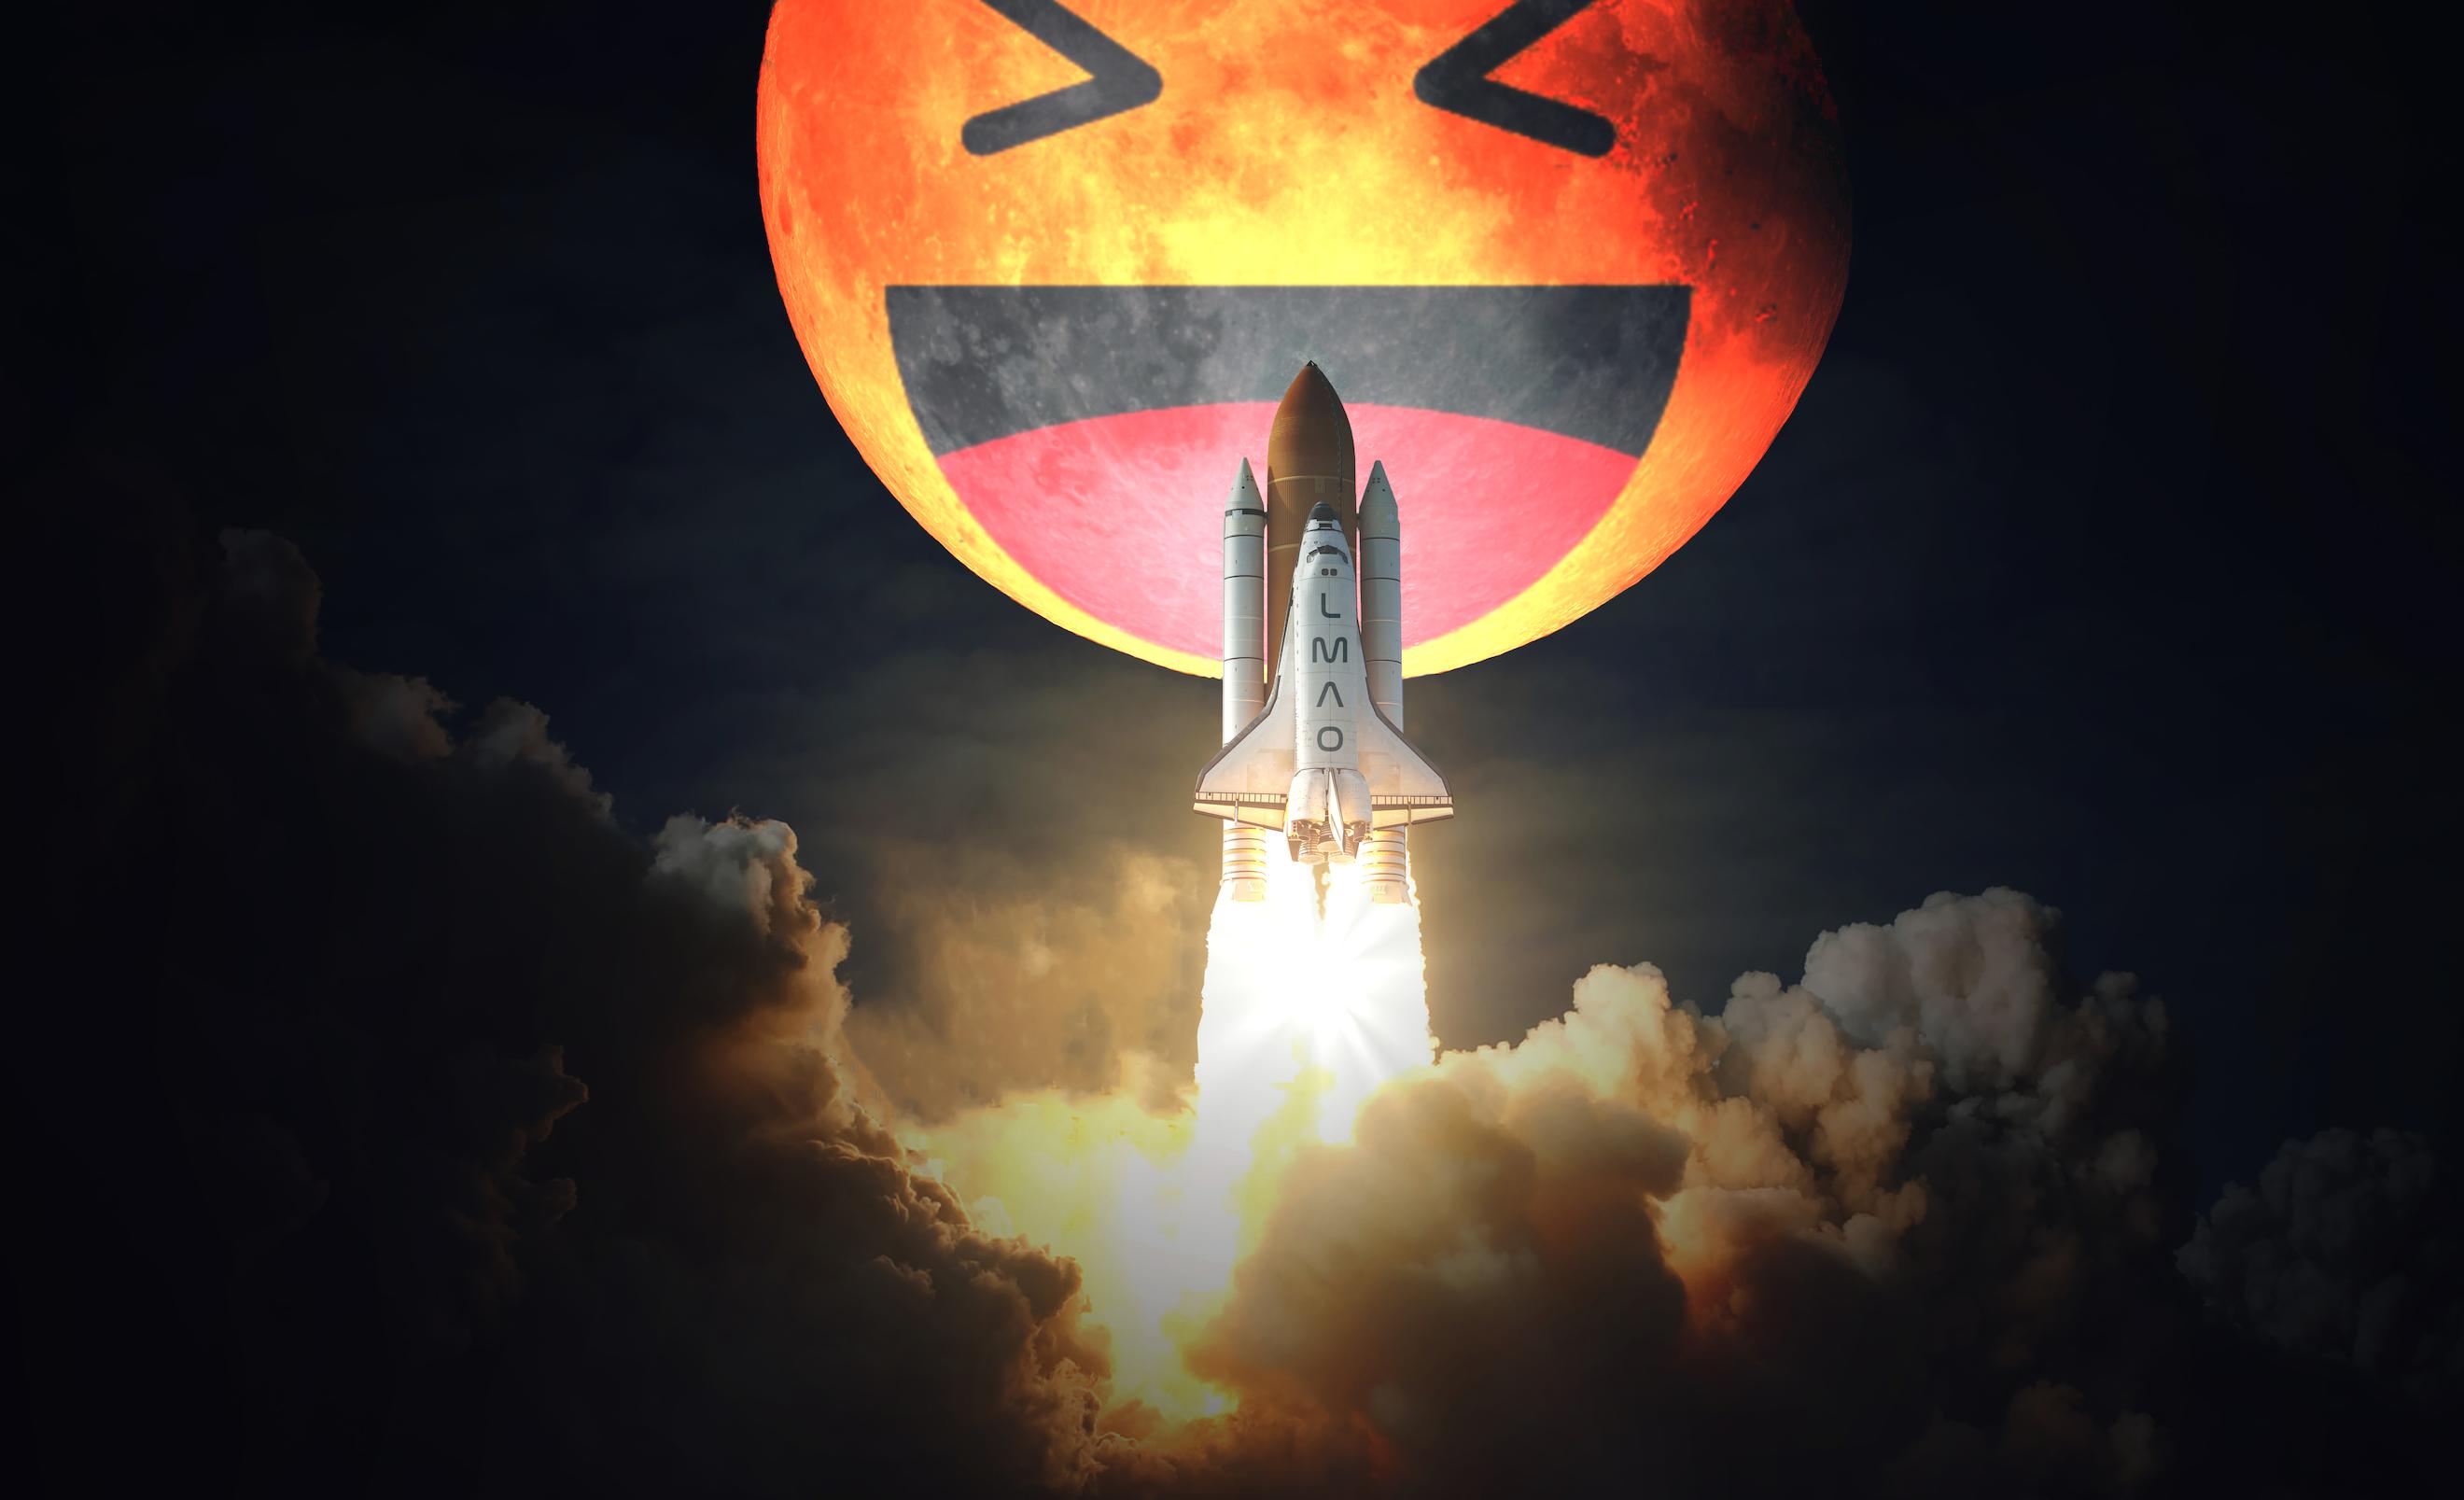 lmao-rocket-launch-meme